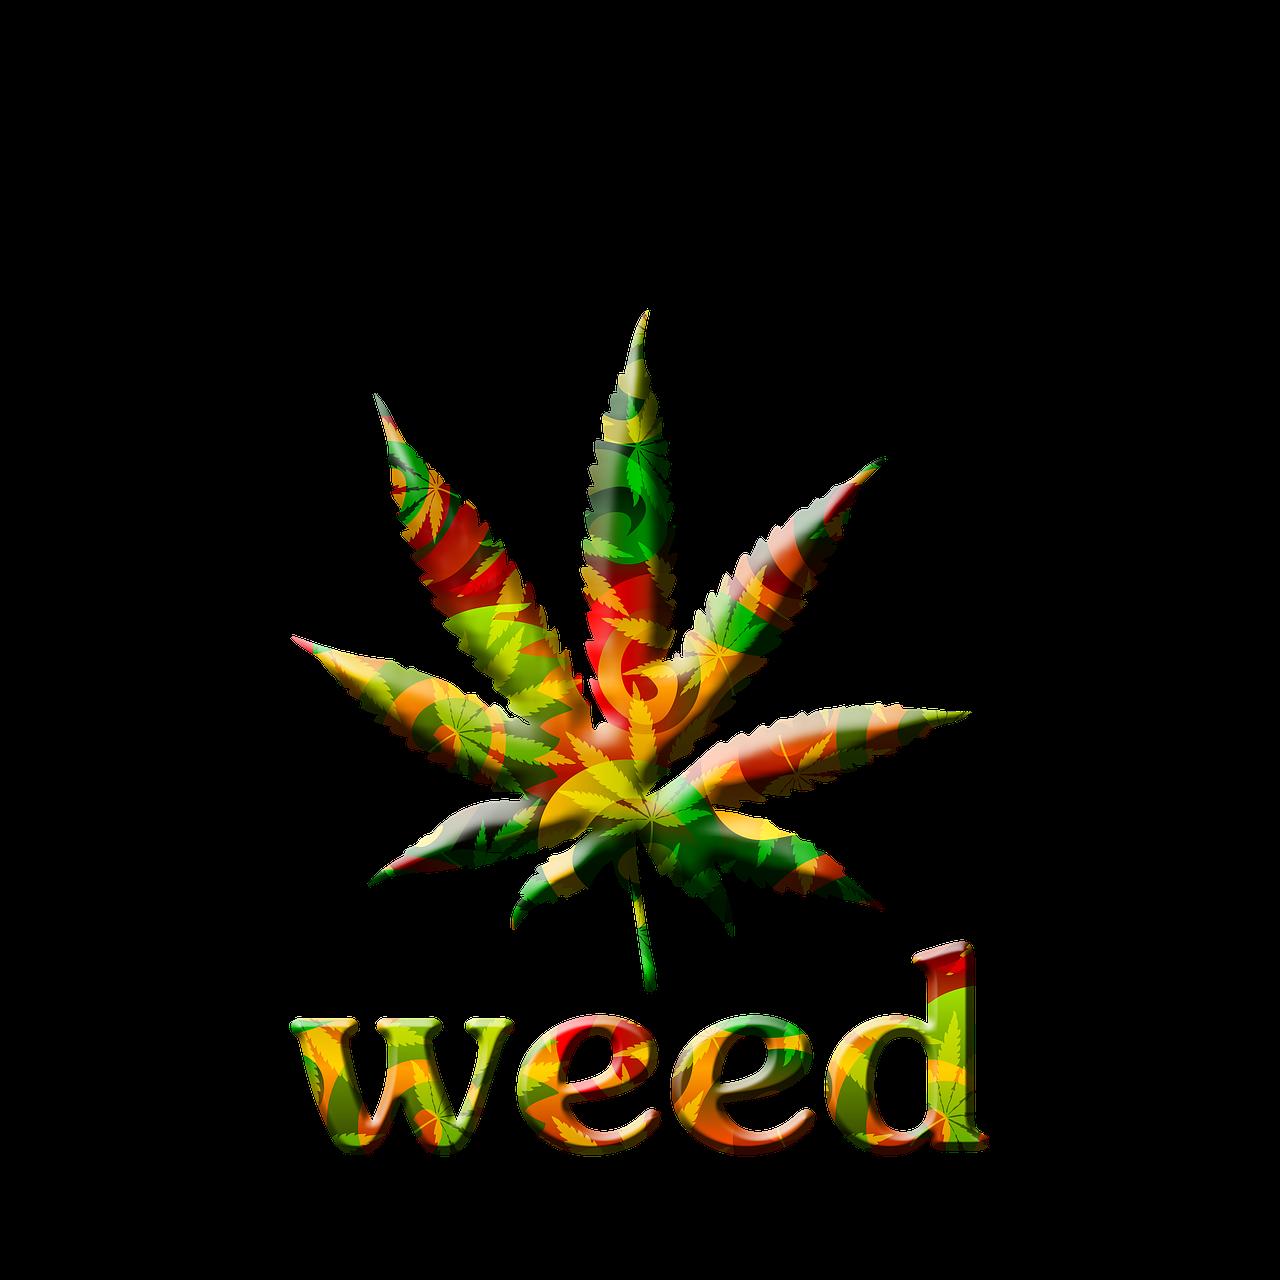 New facts about weed. Marijuana clipart doobie